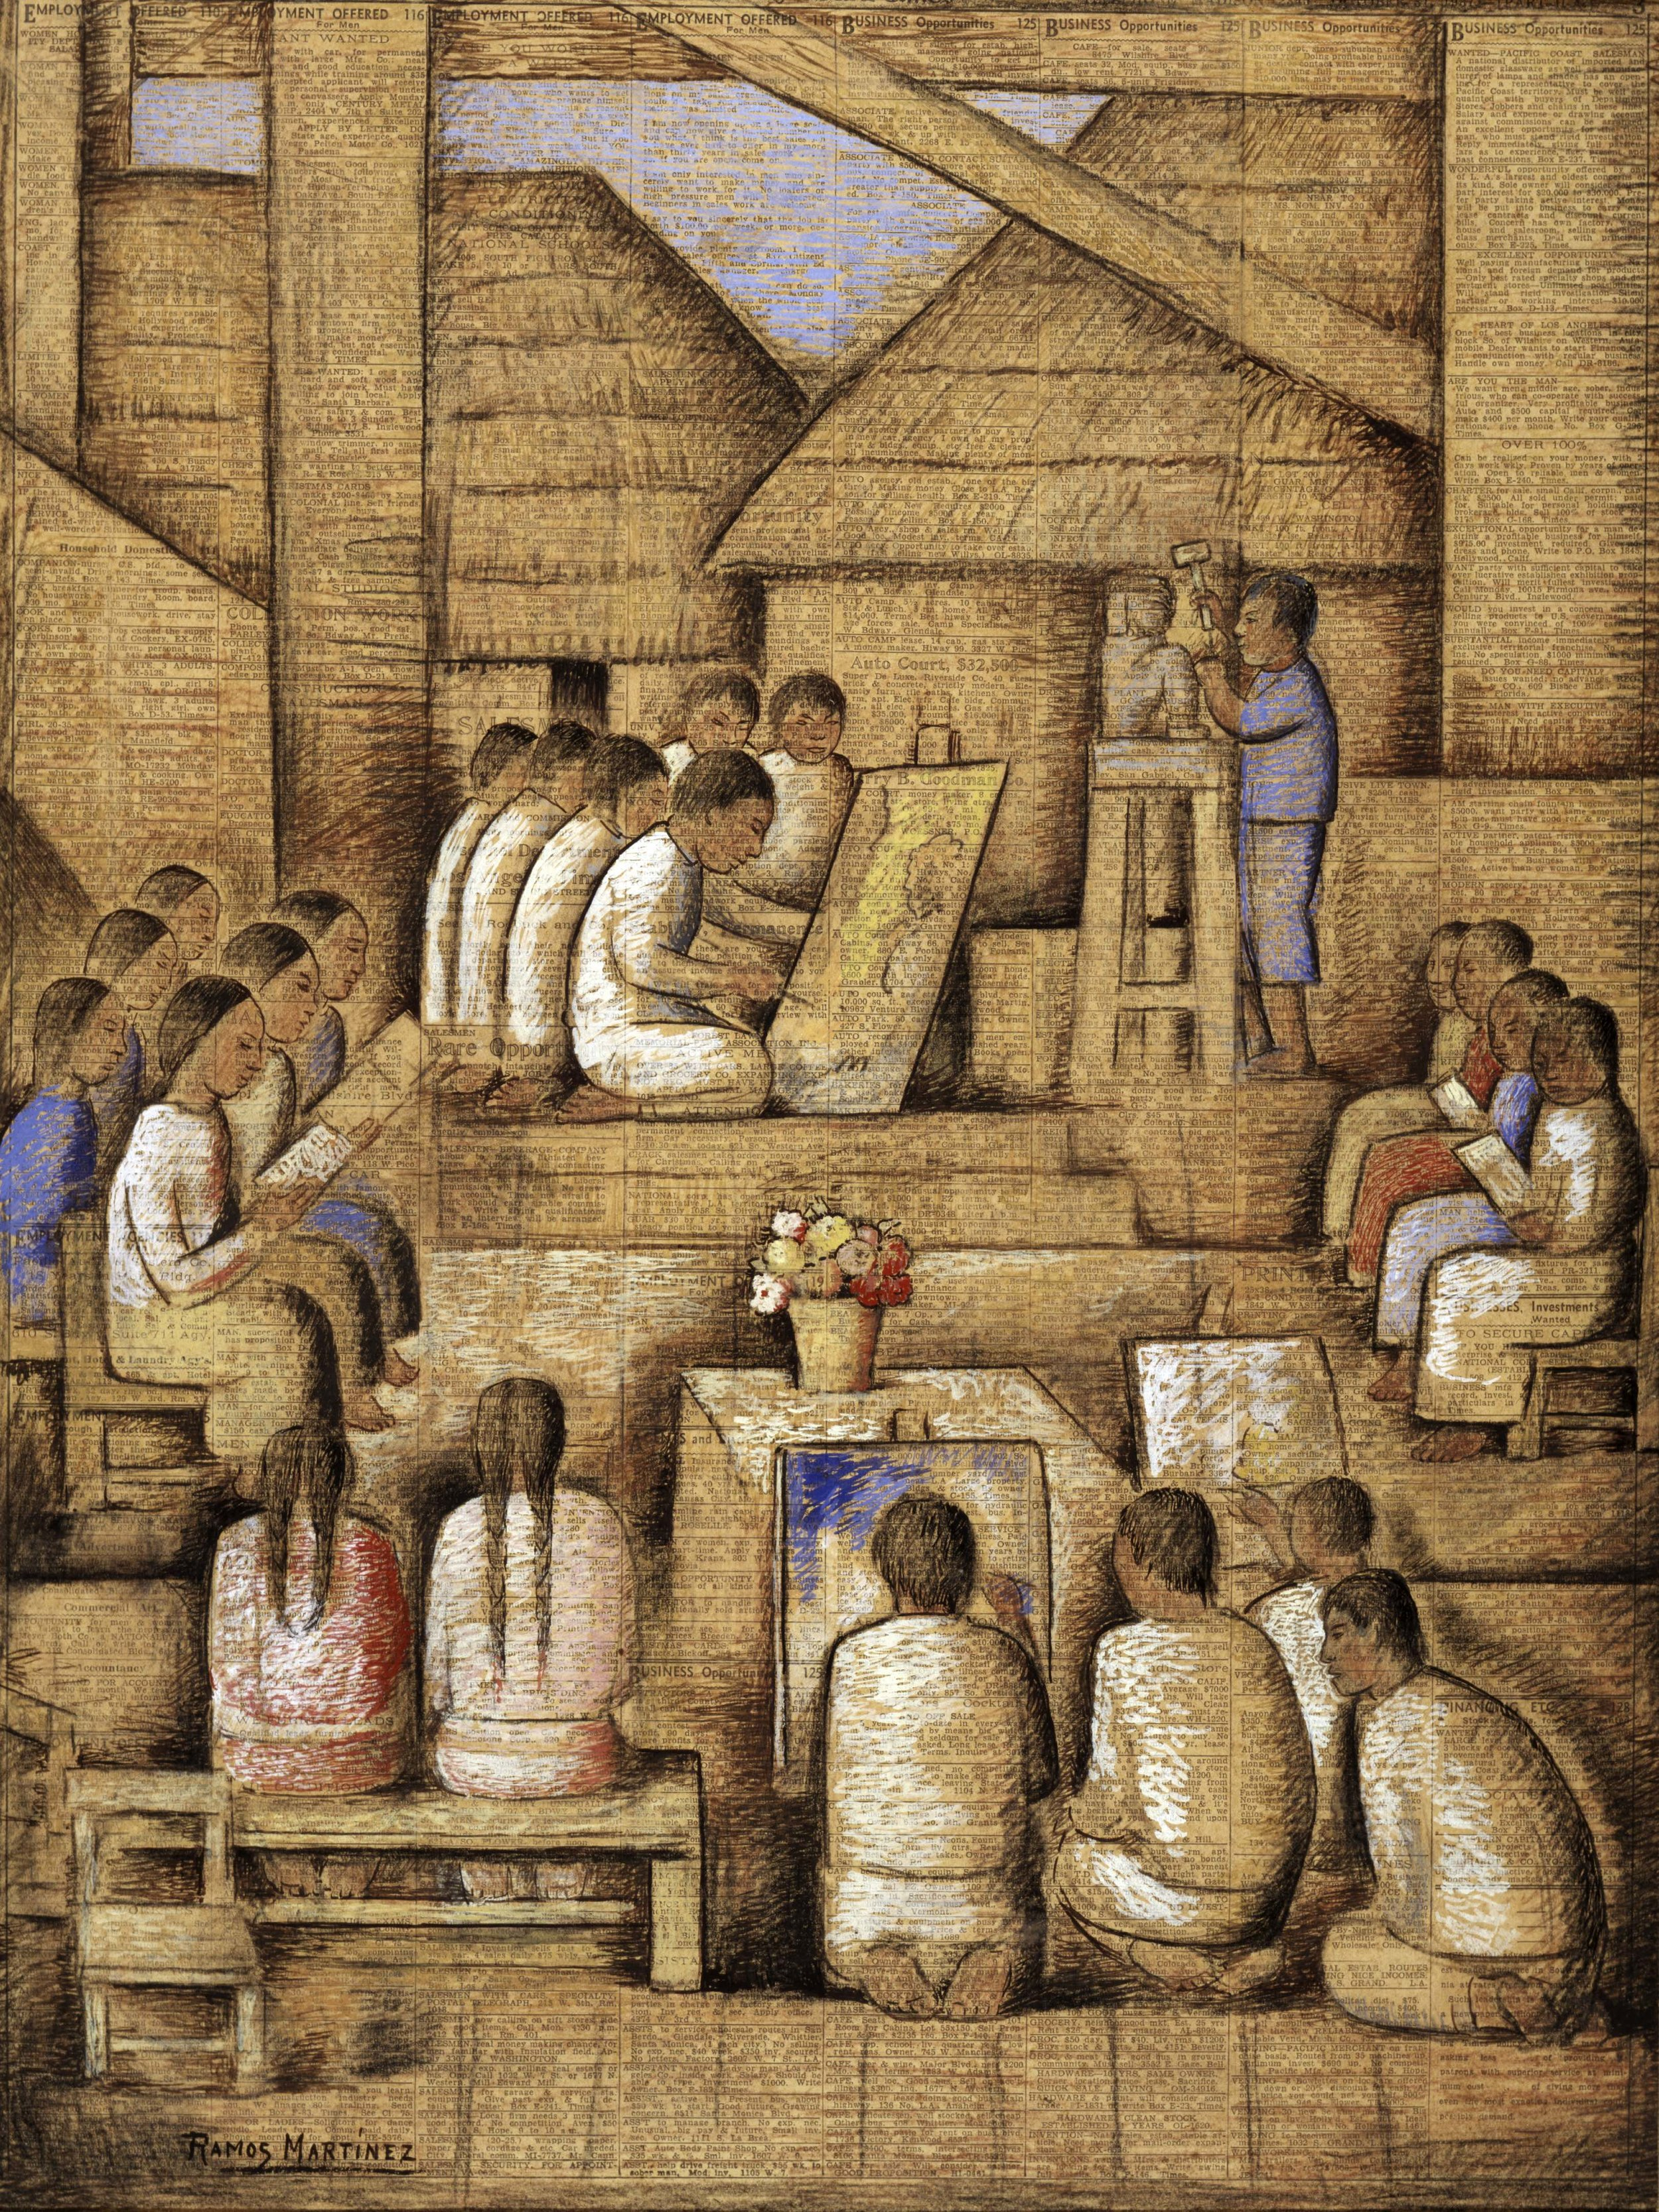 La Escuela / The School  1937 gouache, charcoal, and watercolor on newsprint / guada, carbón, y acuarela sobre papel periódico ( Los Angeles Times ) 21.8 x 16.4 inches / 55.3 x 41.6 centímetros Santa Barbara Museum of Art, Gift of the P.D. McMillan Land Company